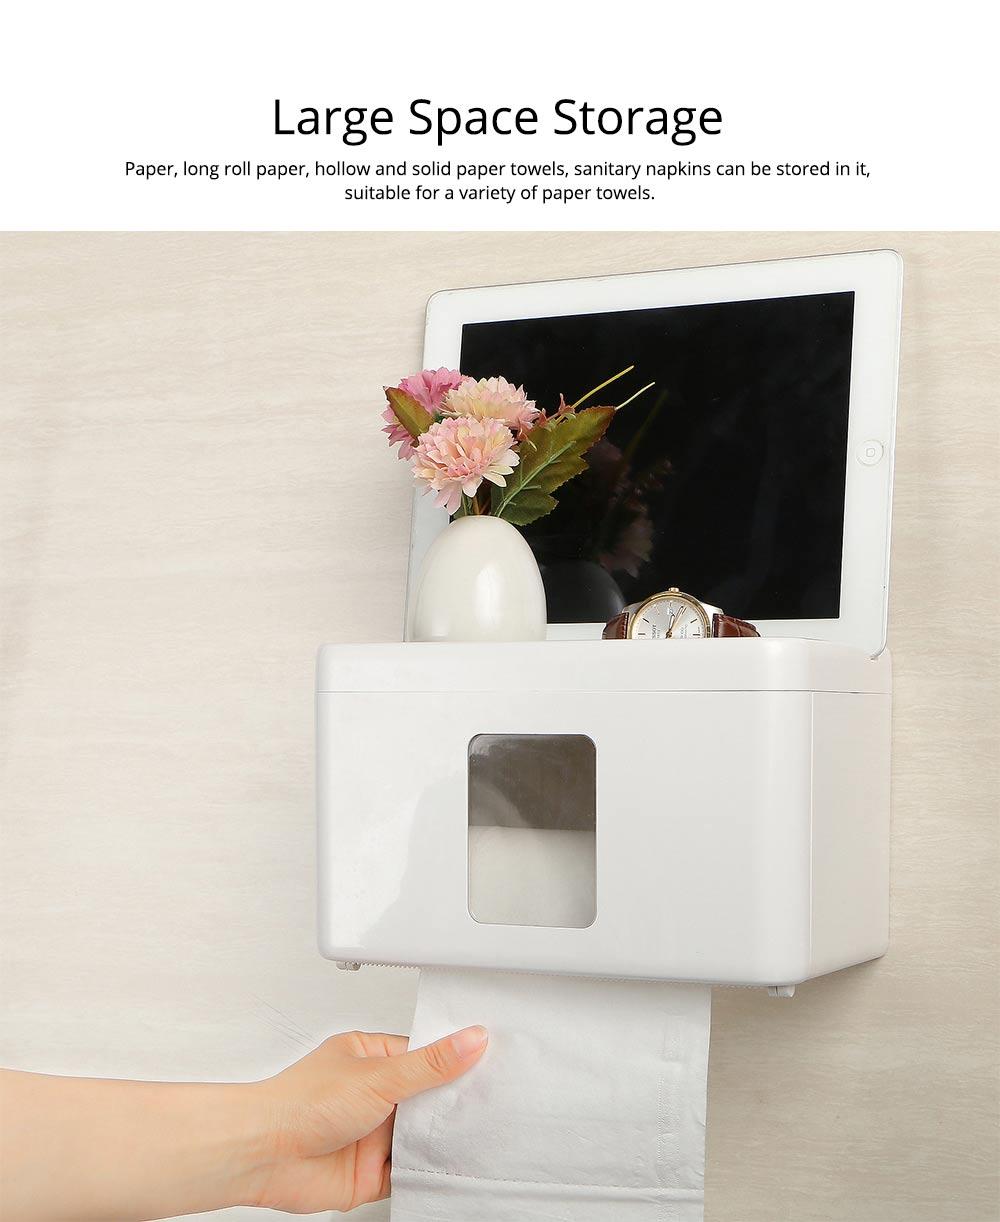 Wall Mount Toilet Paper Rack - Free Punching 2